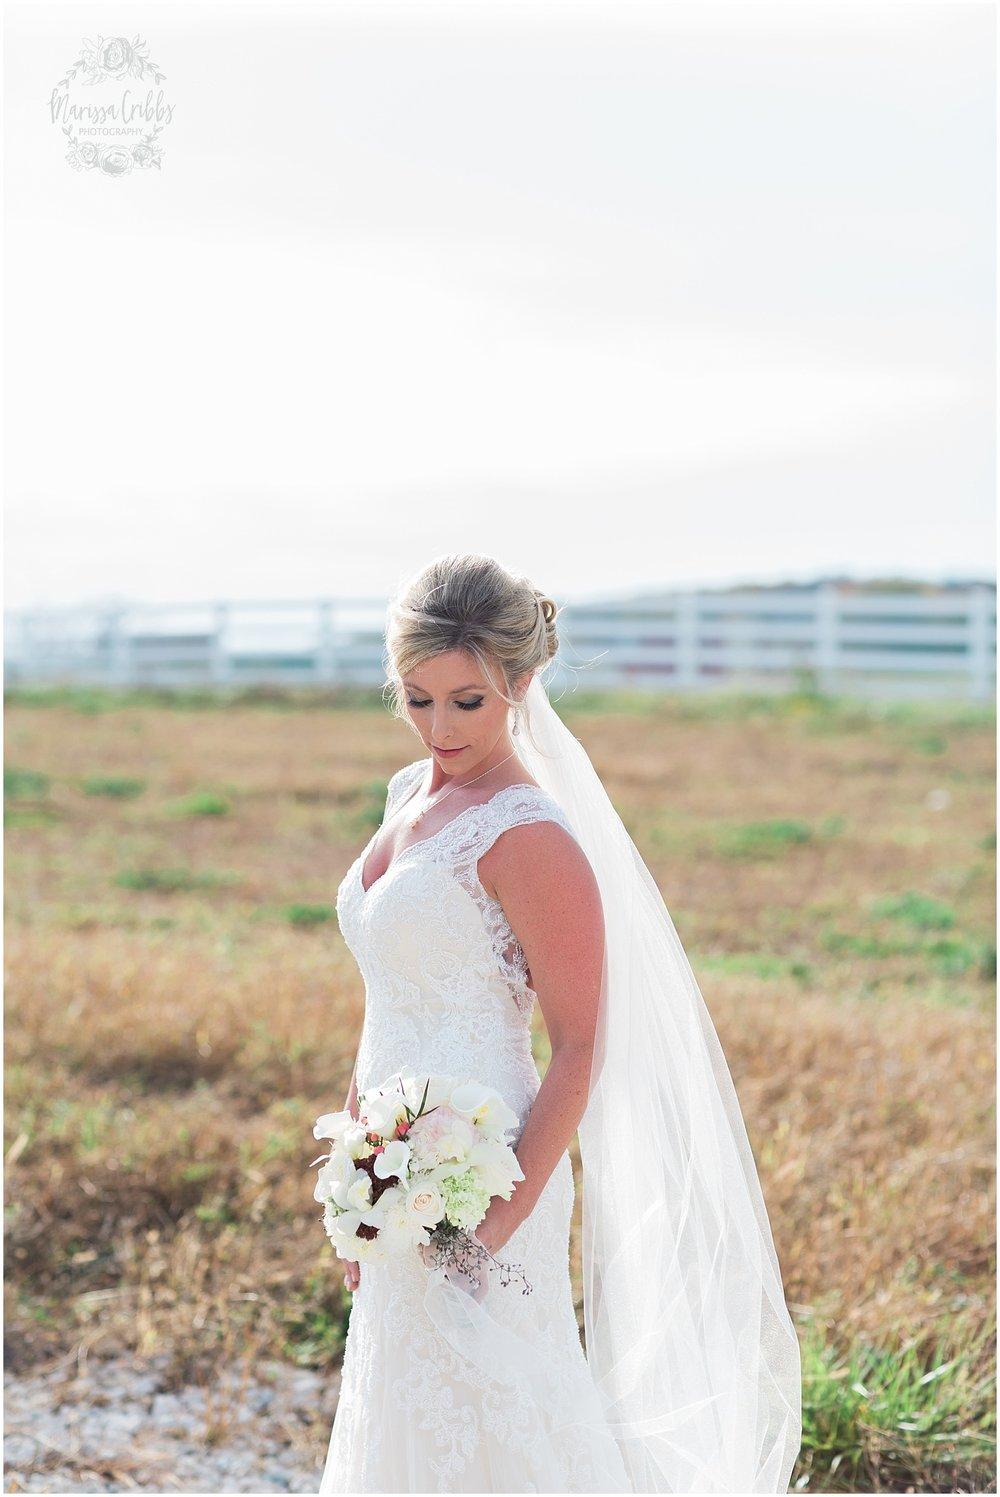 Alex+&+Amie+_+Eighteen+Ninety+Event+Space+_+Marissa+Cribbs+Photography+_+Kansas+City+Perfect+Wedding+Guide_1284.jpg